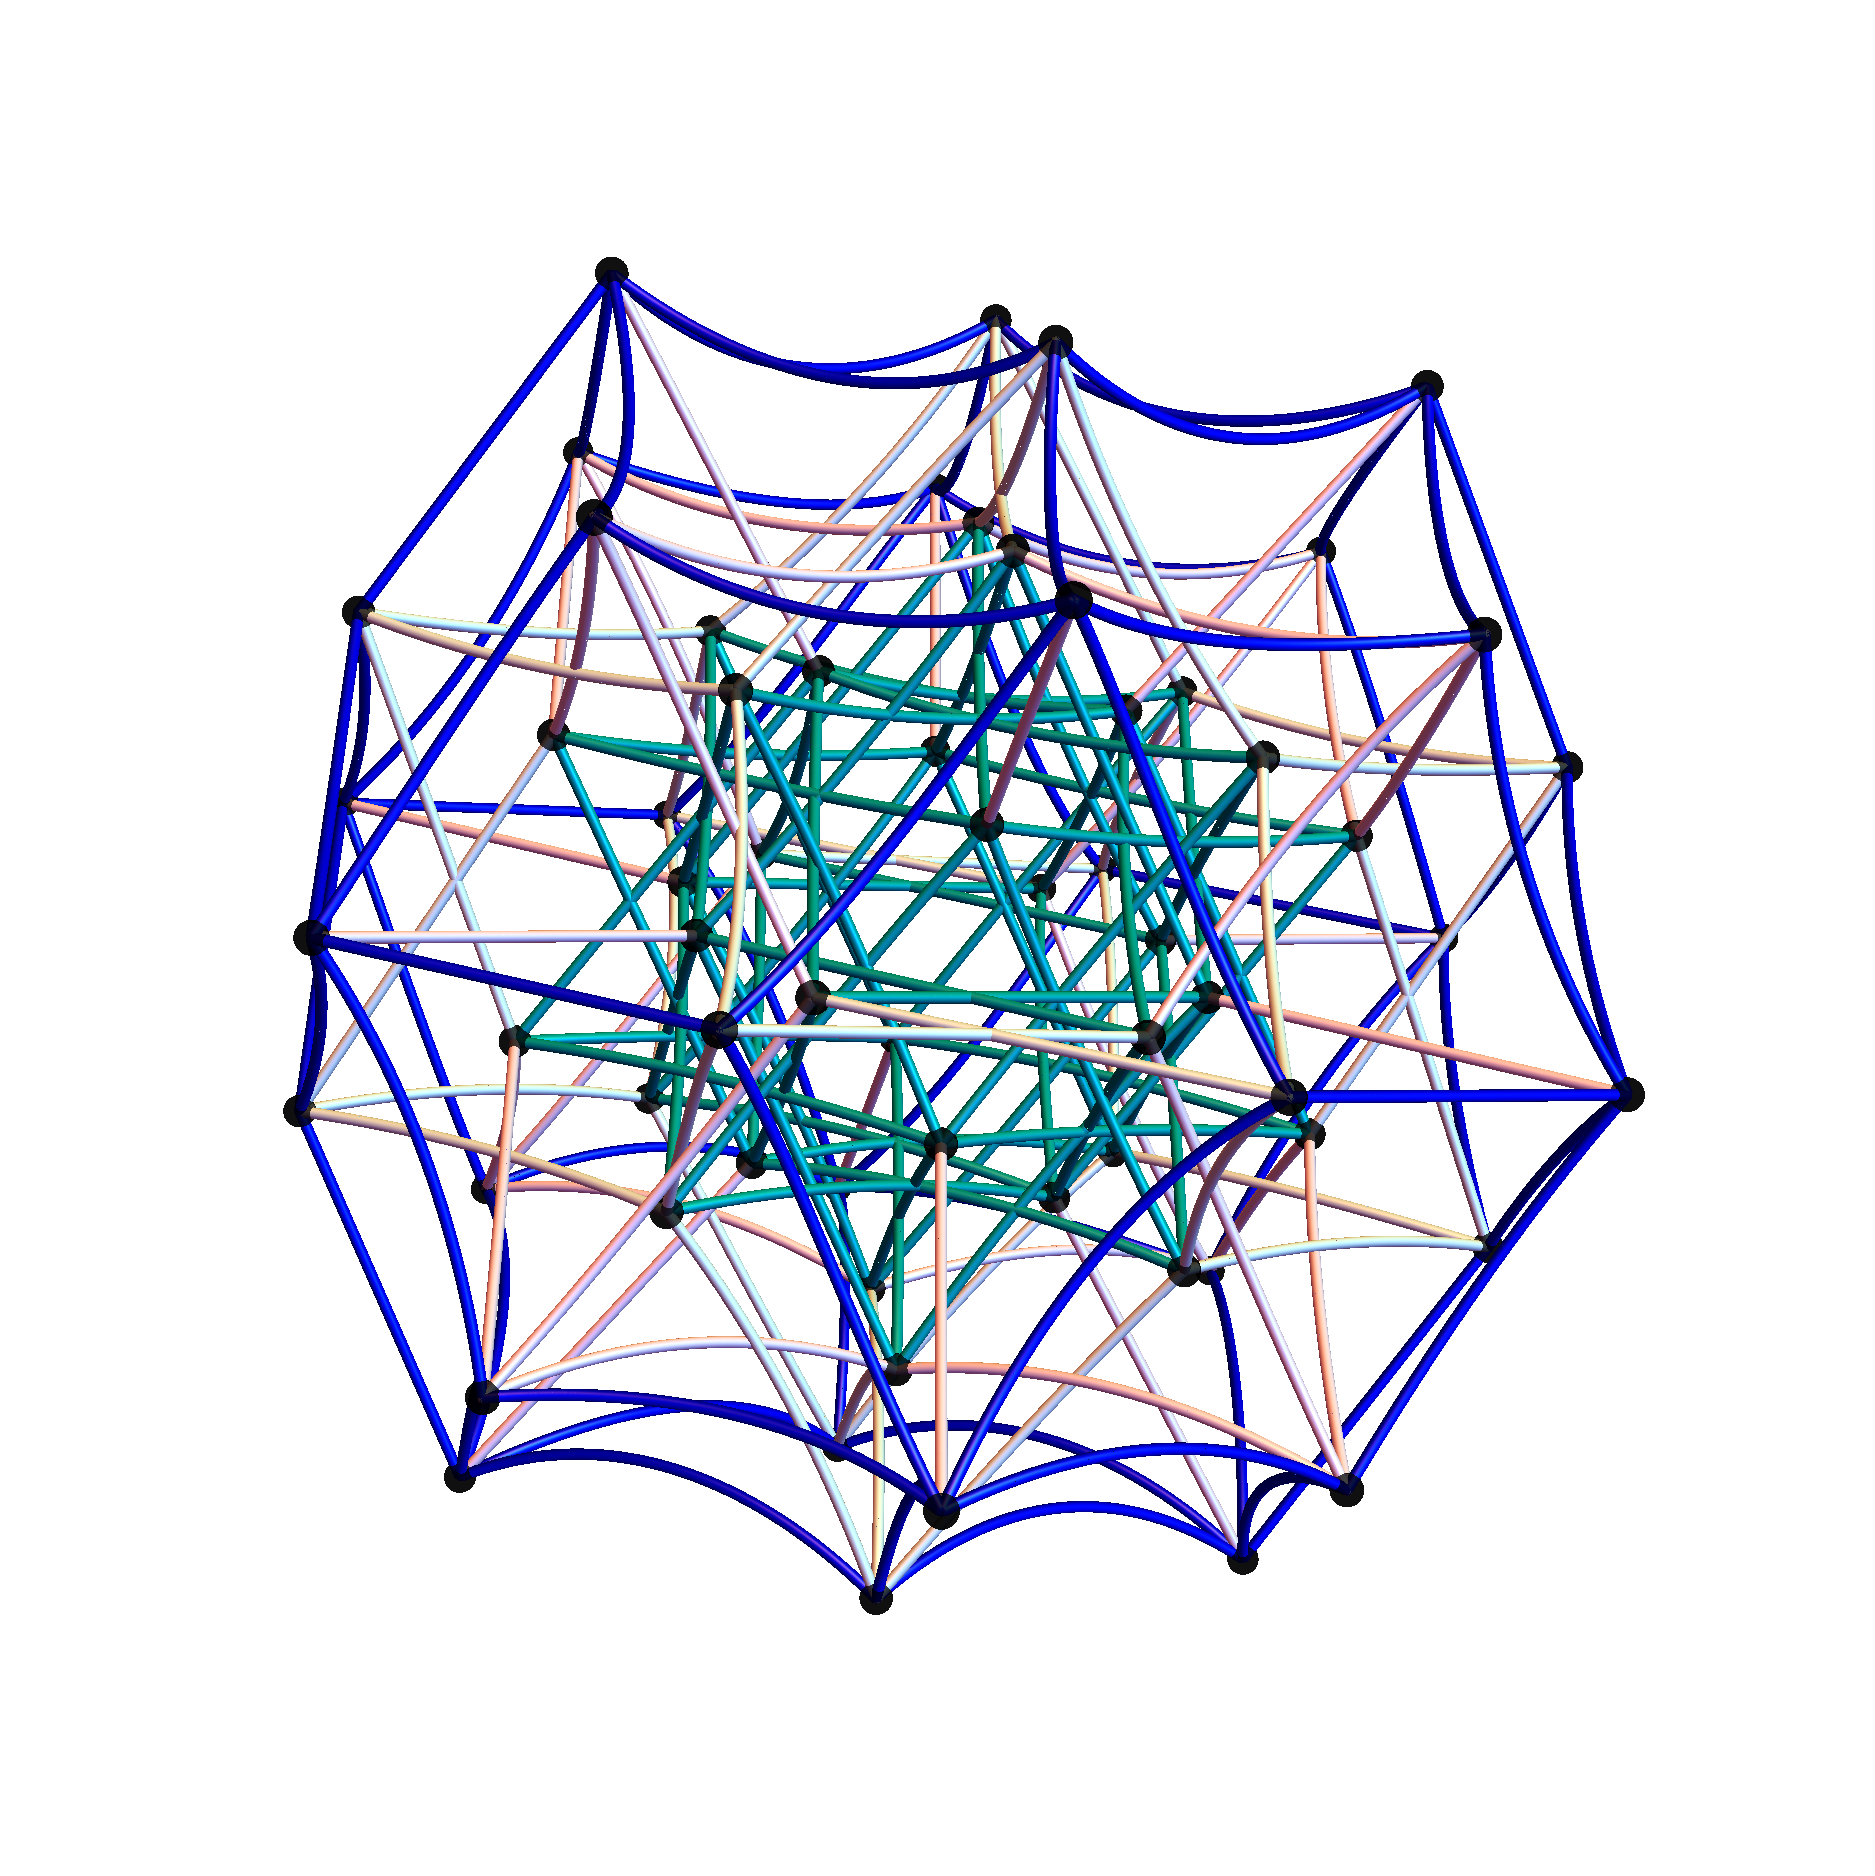 hyperCrystal